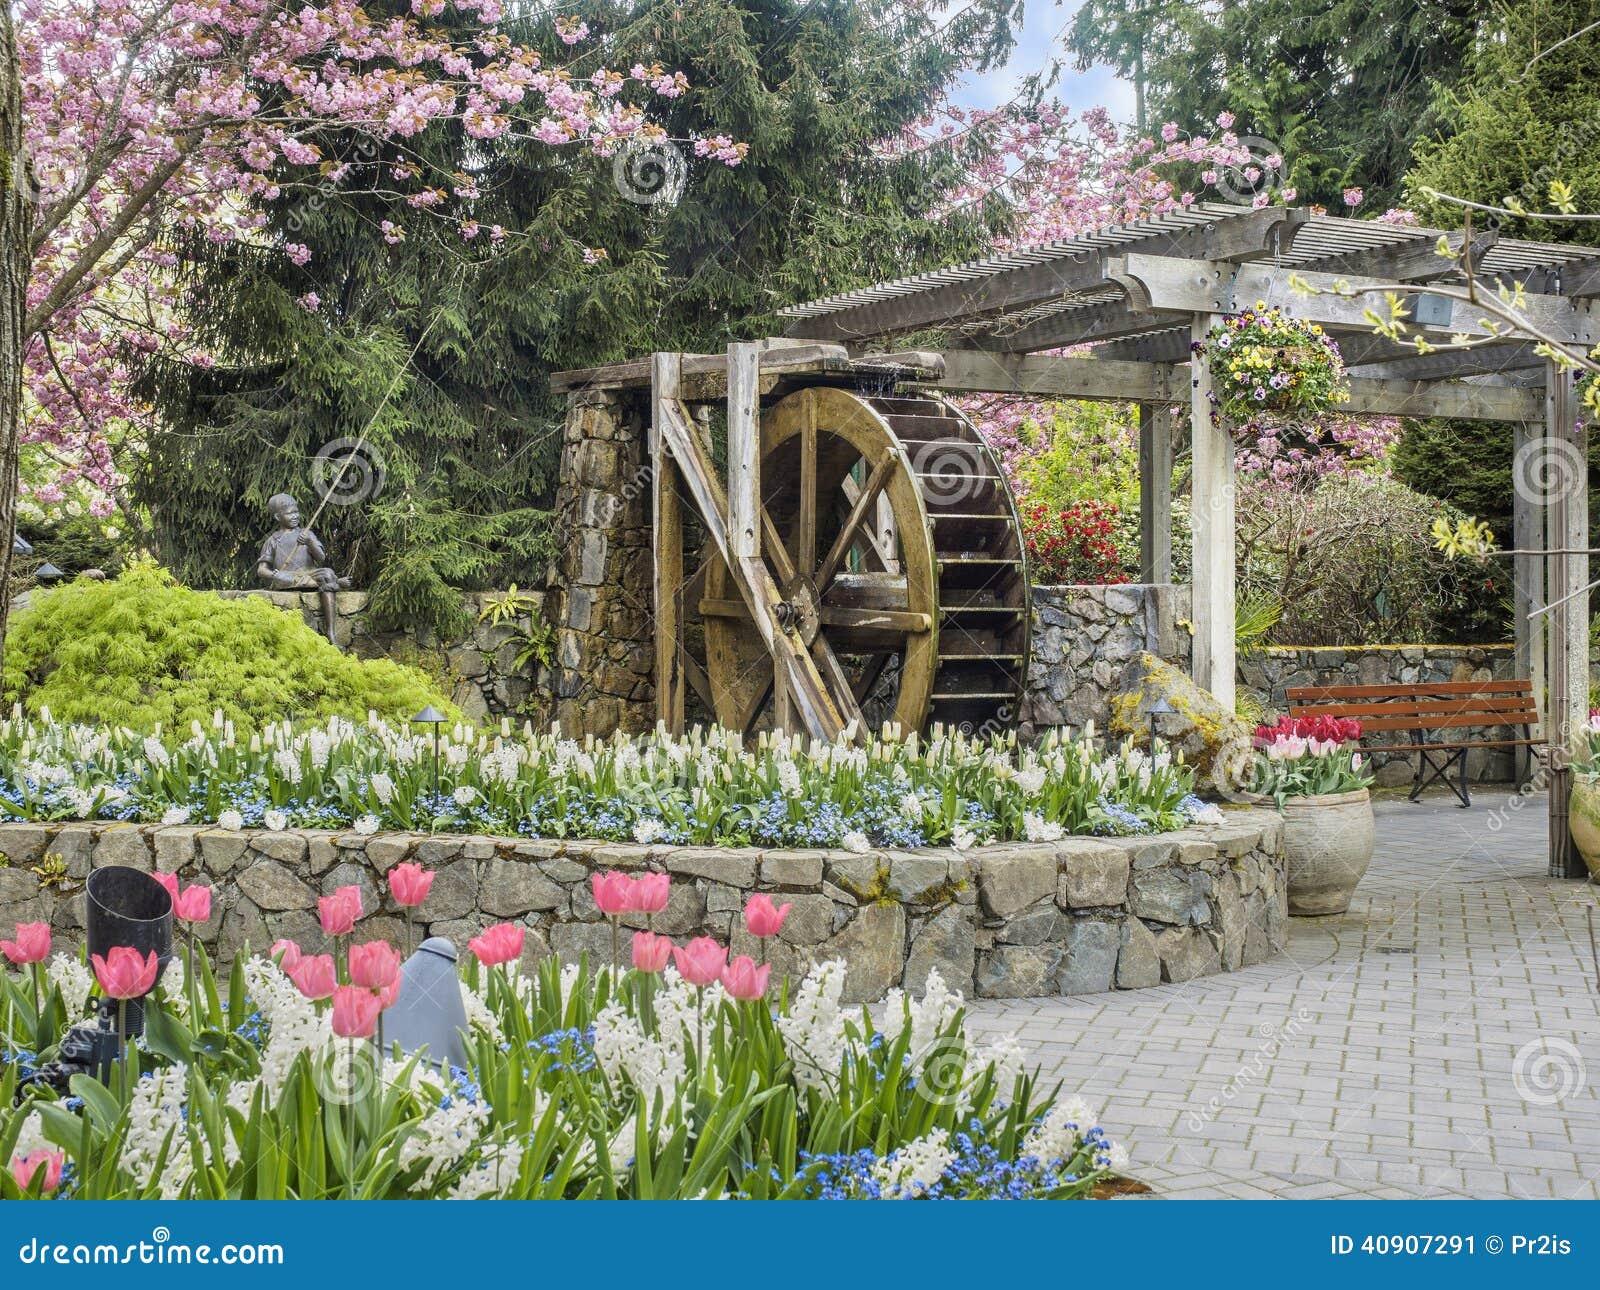 Water wheel in butchart gardens victoria british columbia for Garden design victoria bc